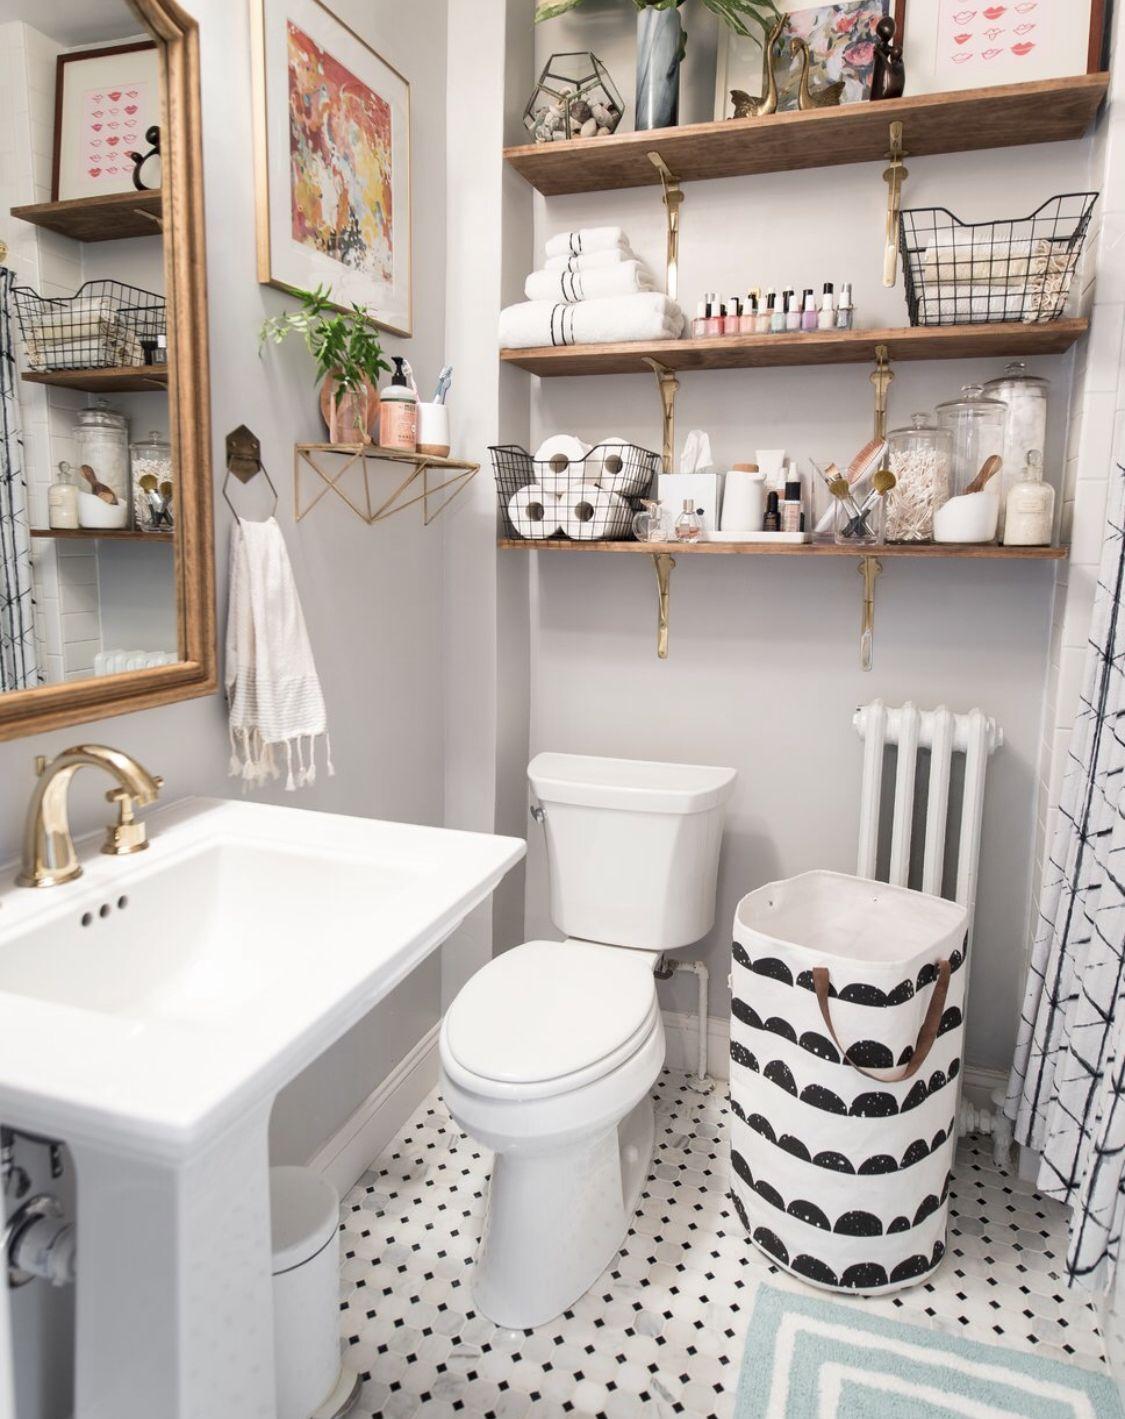 Home Decor 20 Cute Bathroom Countertop Ideas You Can Copy Now Classic Small Bathrooms Small Bathroom Furniture Bathroom Decor Apartment